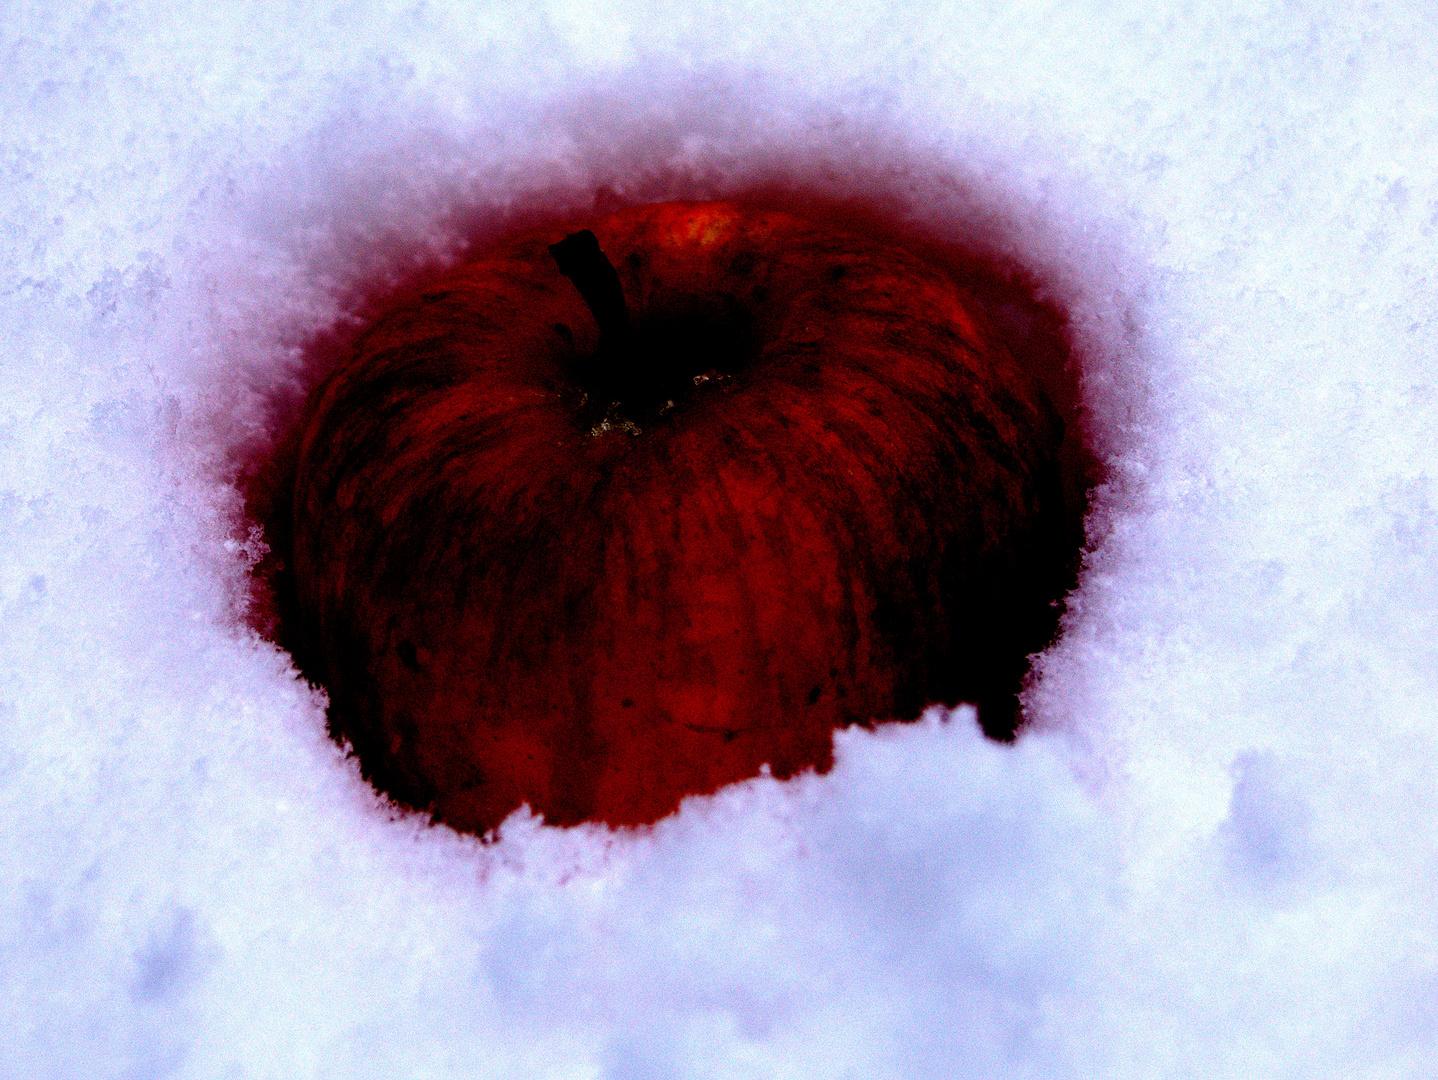 blutroter Apfel im Schnee